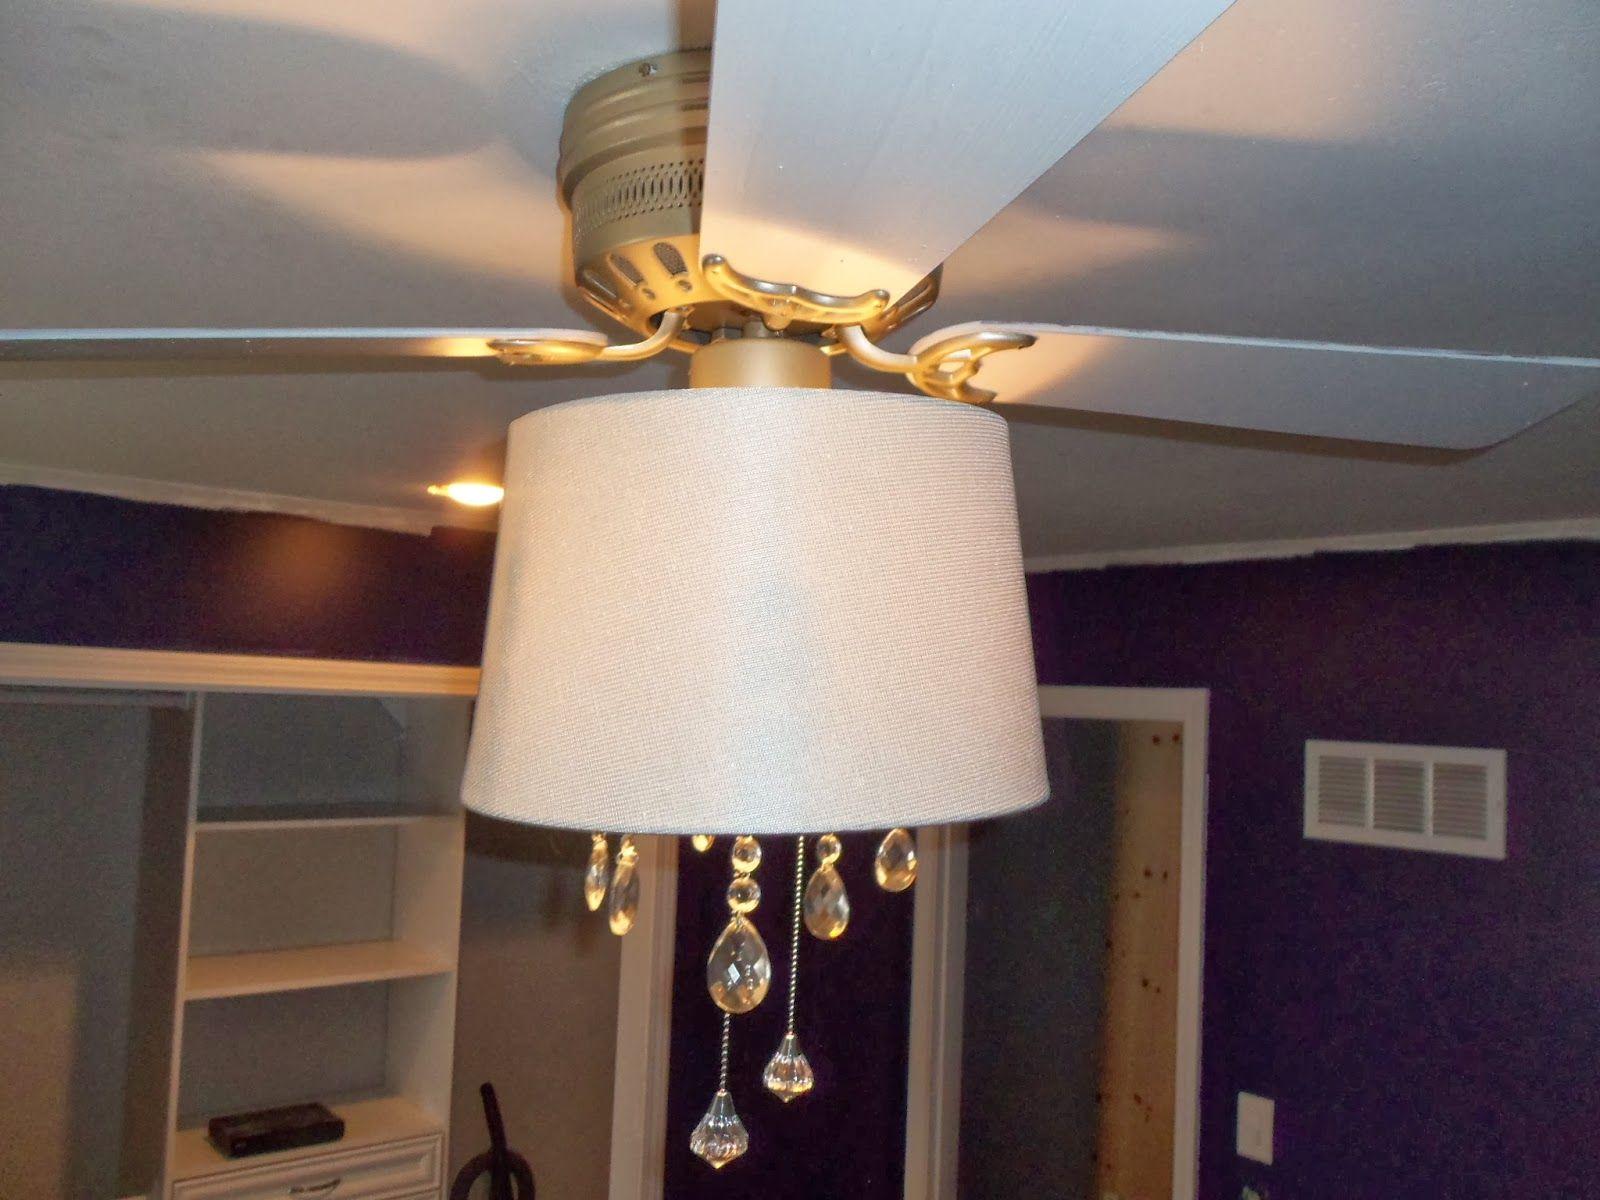 The Schorr Thing DIY Ceiling Fan Chandelier